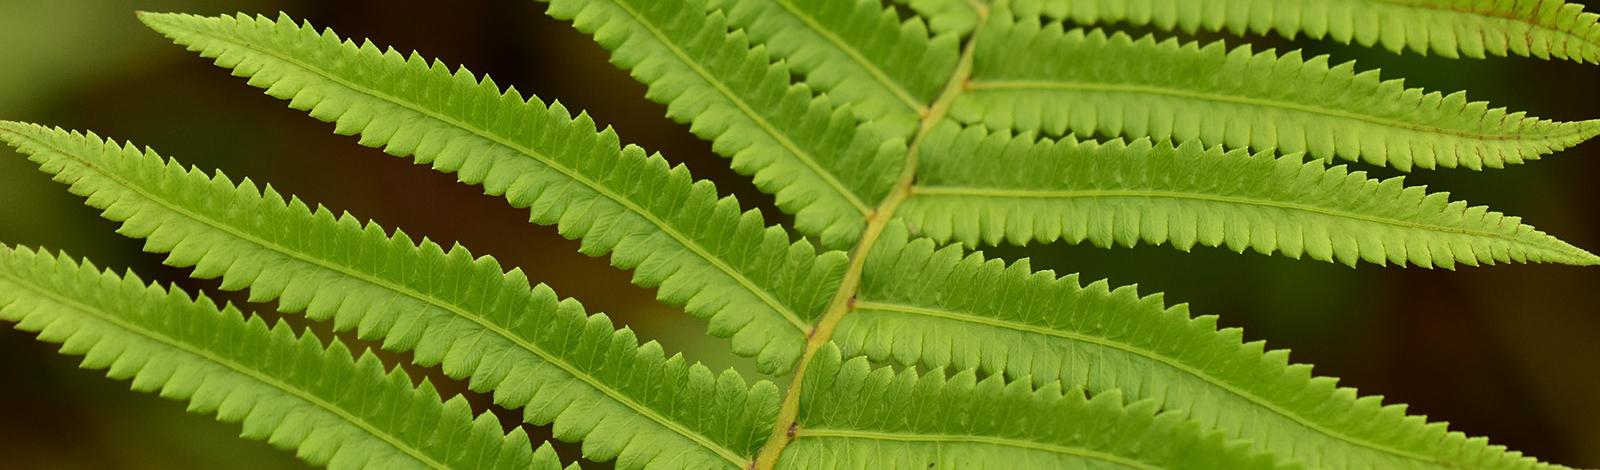 A beautiful green plant